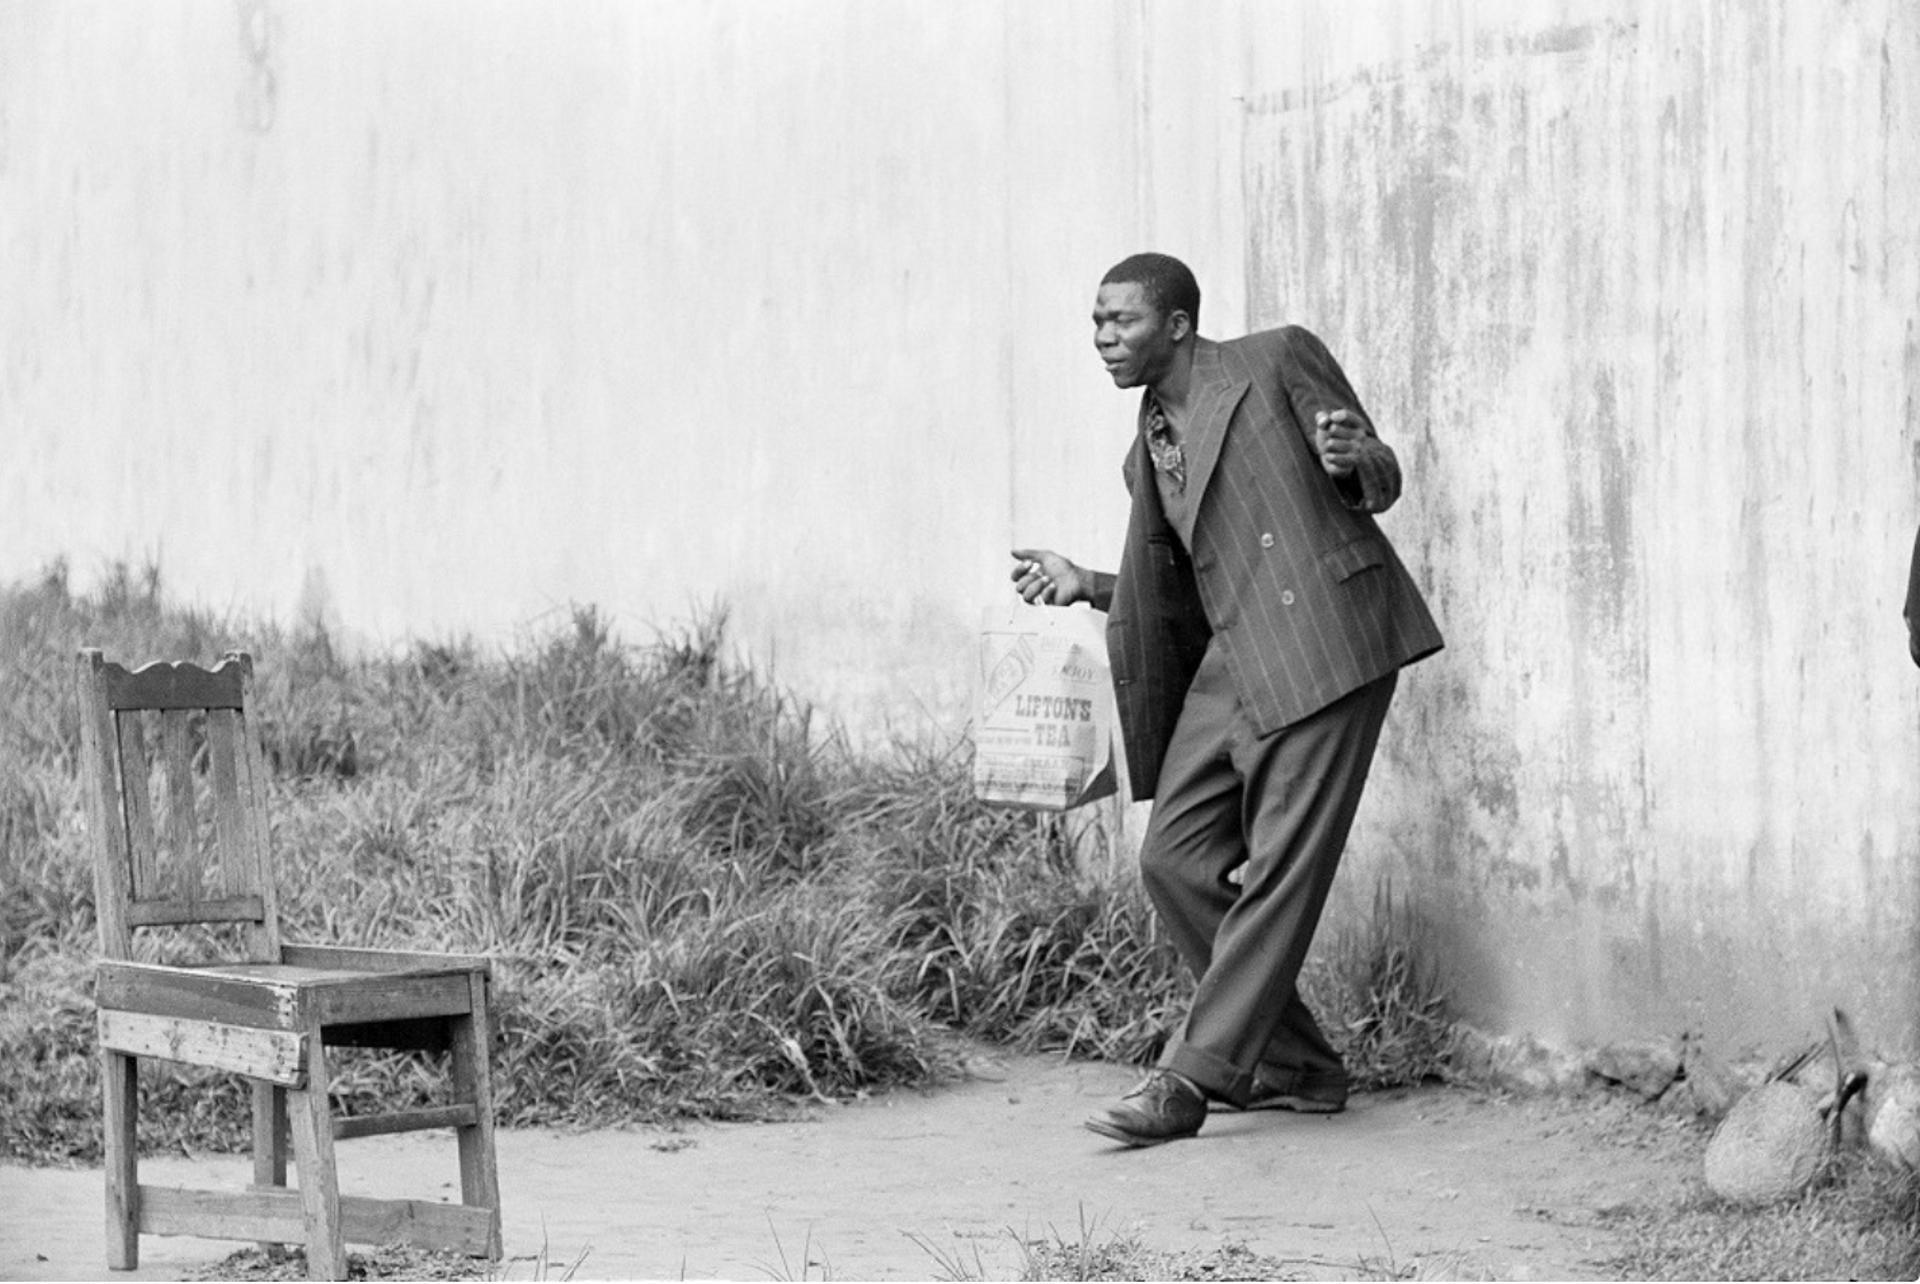 David Goldblatt, Portrait photographer and client, Braamfontein (3_1538, 3_1539), 1955. Courtesy of Goodman Gallery